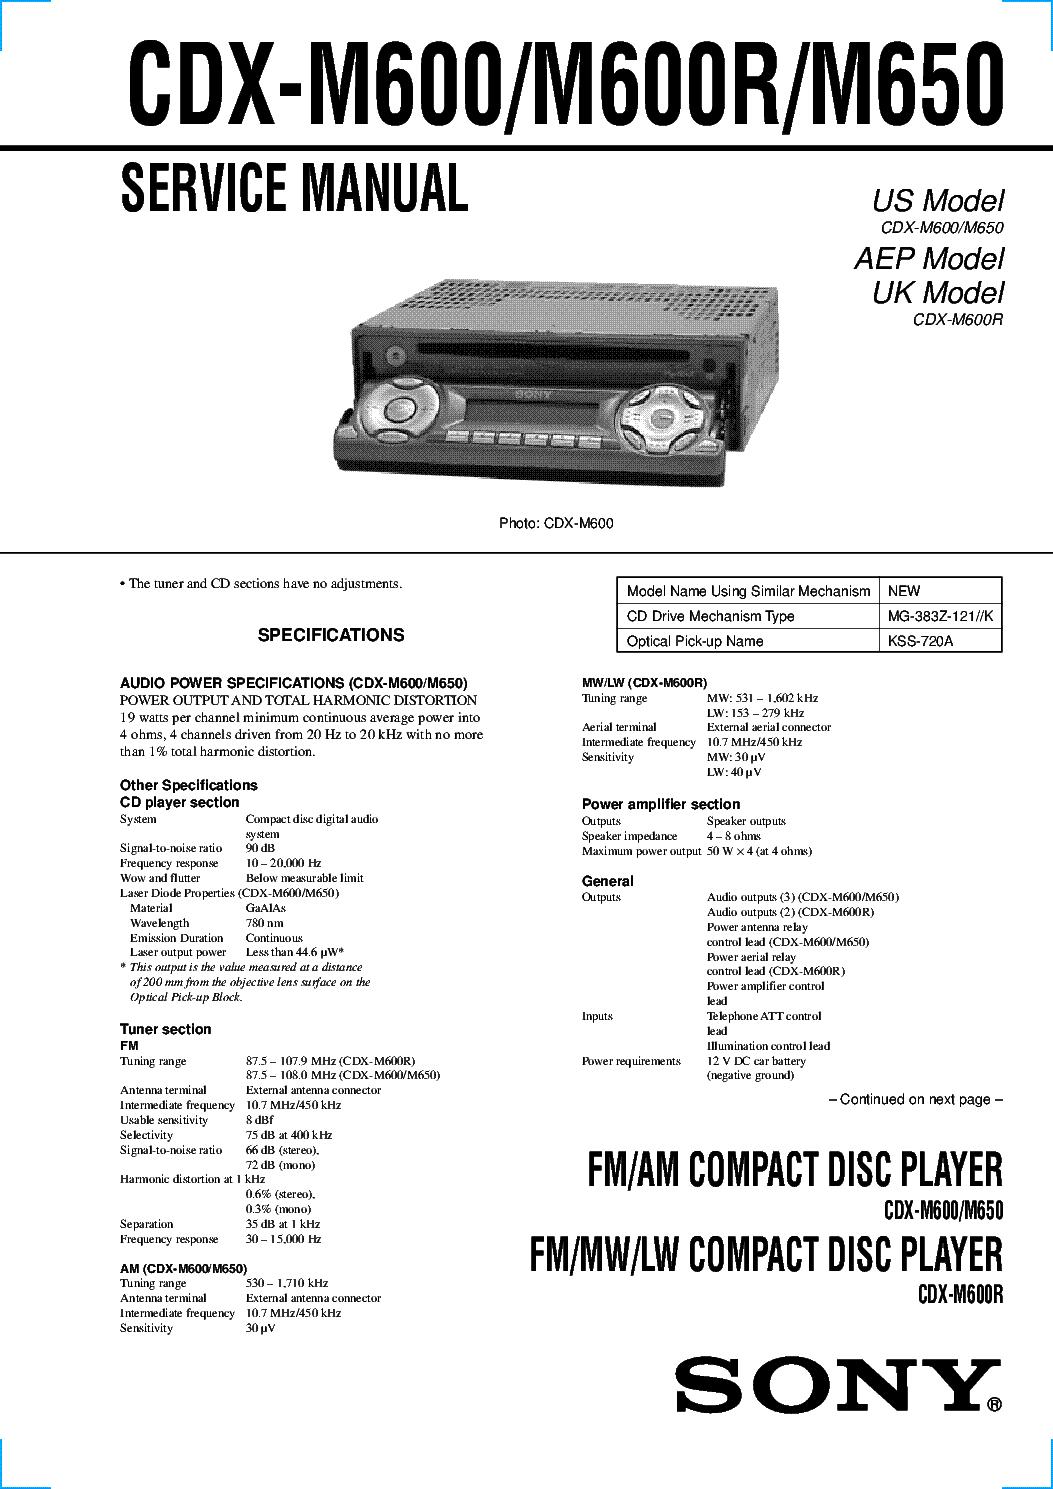 SONY CDX-M600 CDX-M600R CDX-M650 service manual (1st page)